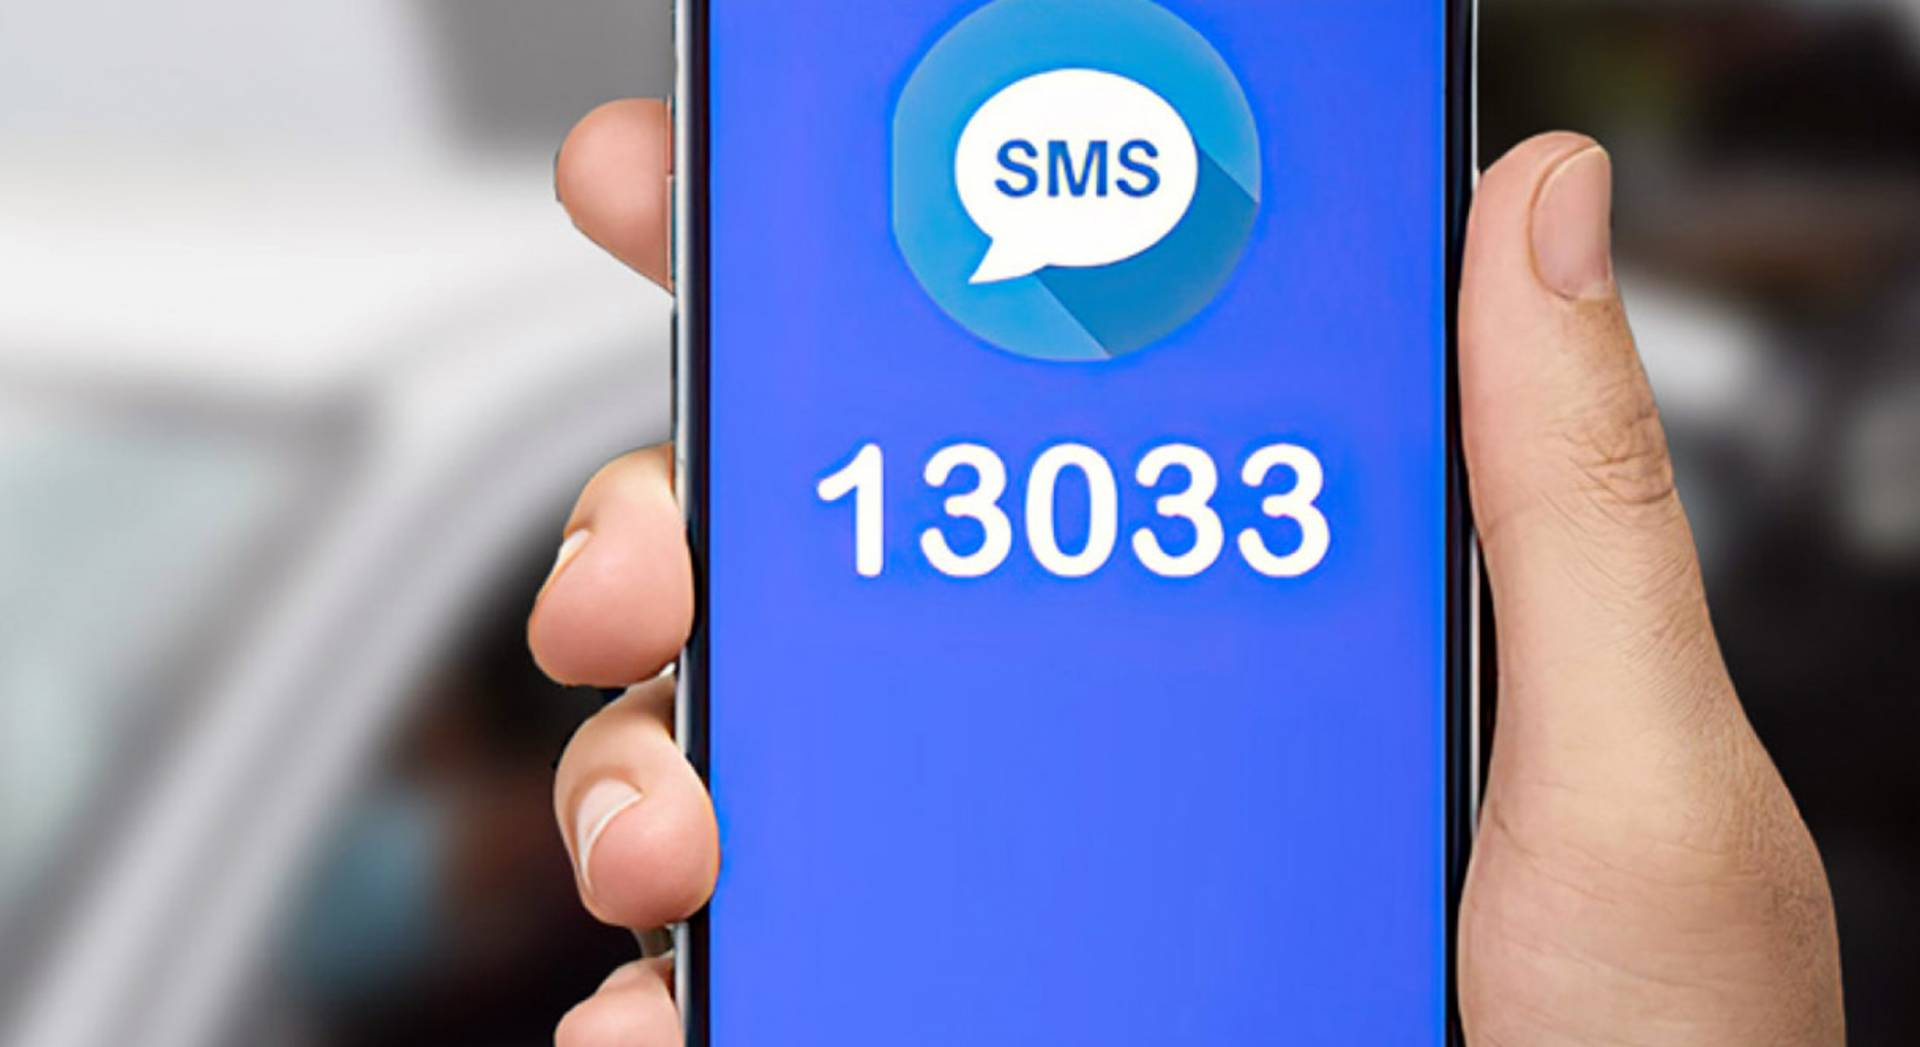 Lockdown: Αντίστροφη μέτρηση για το τέλος των SMS